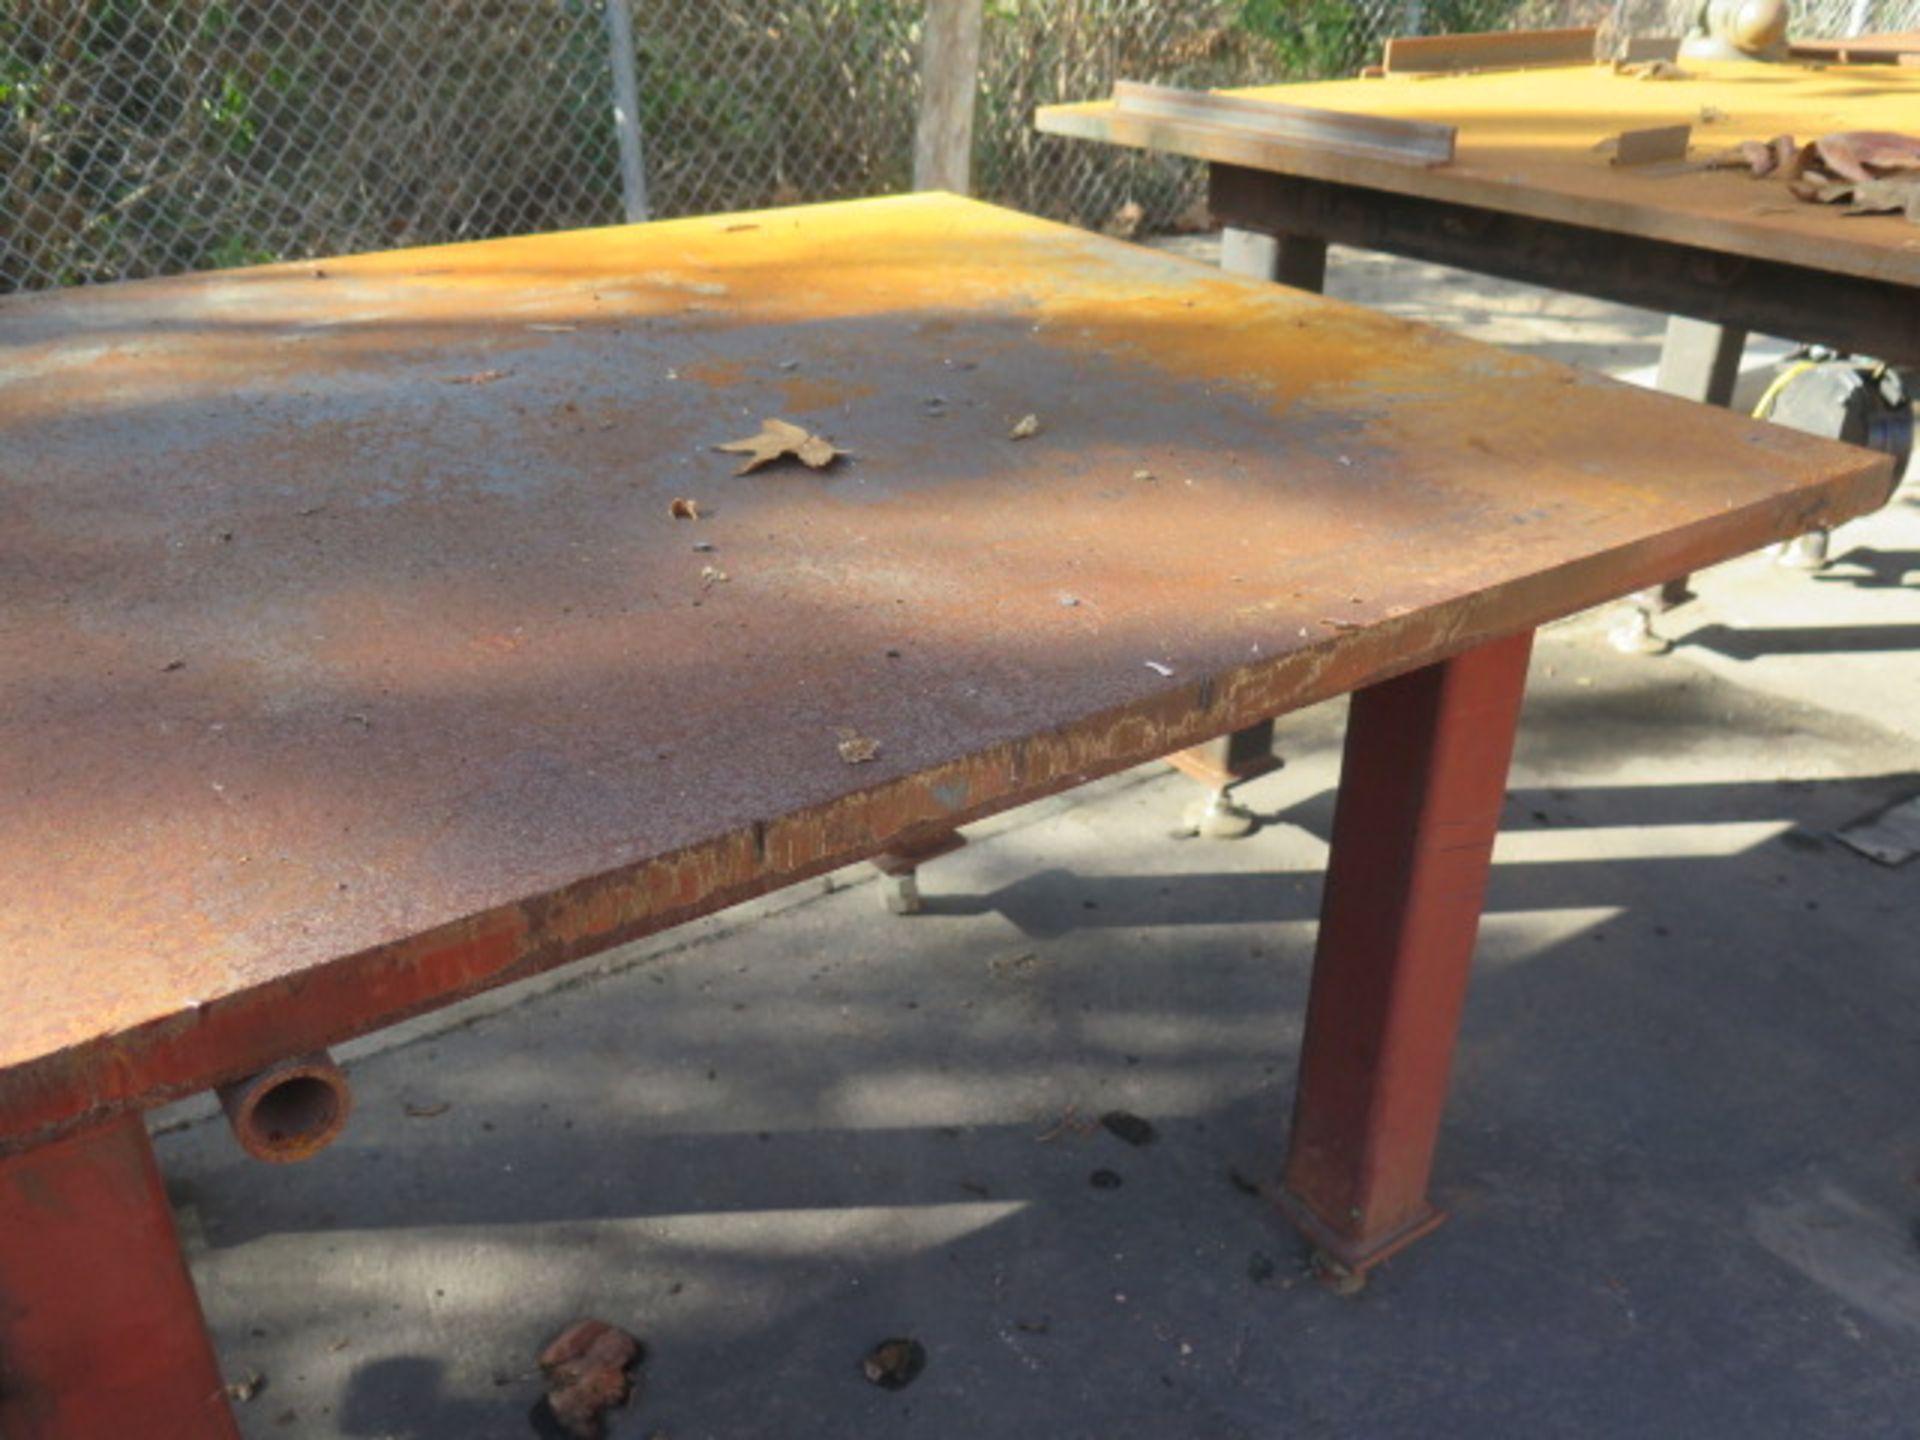 "4' x 8' x 1 1/2"" Steel Welding Table (SOLD AS-IS - NO WARRANTY) - Image 2 of 5"